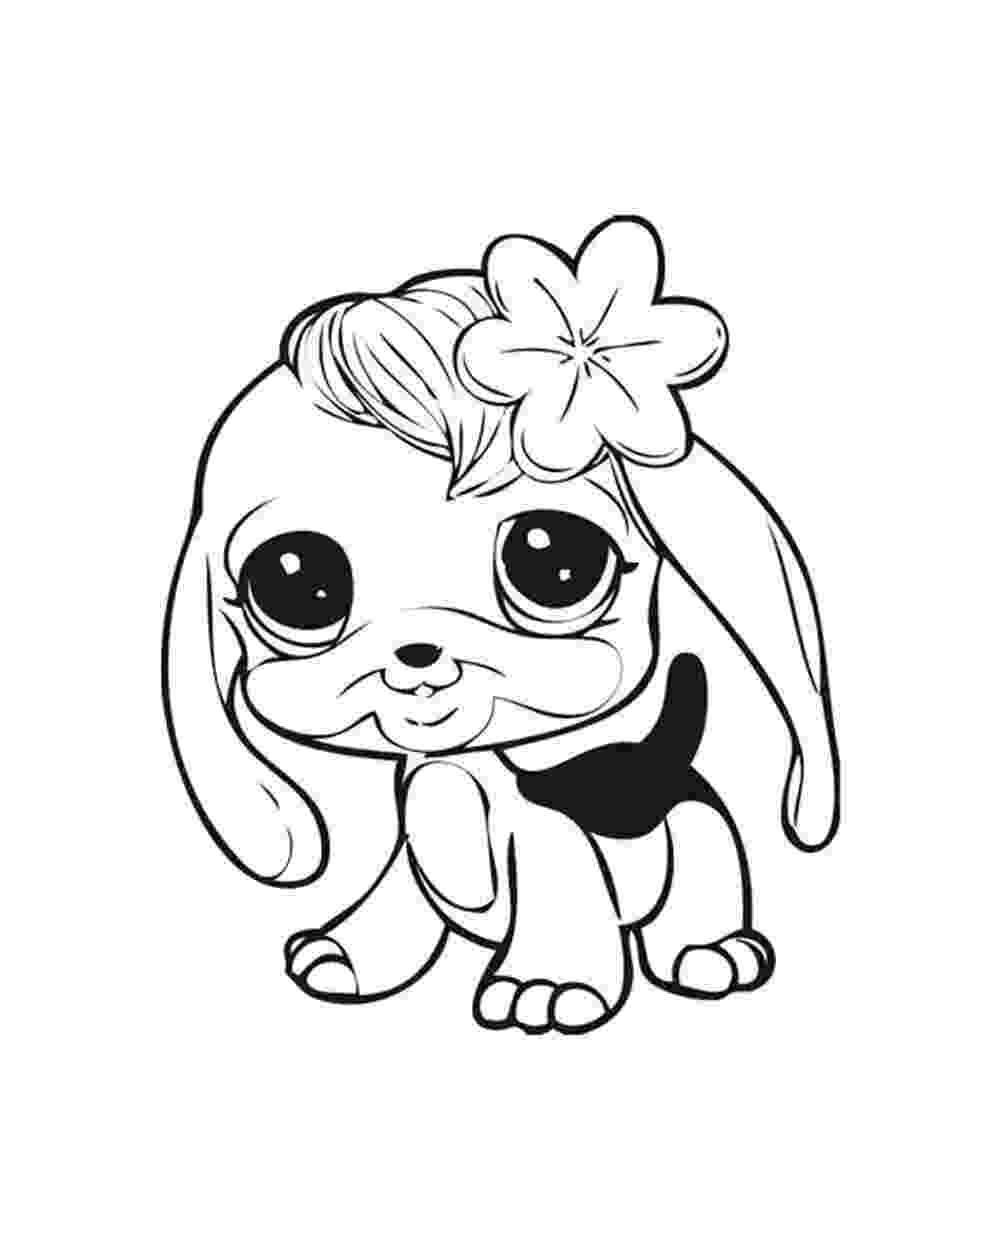 shop coloring page quirky artist loft 39cuties39 free animal coloring pages page coloring shop